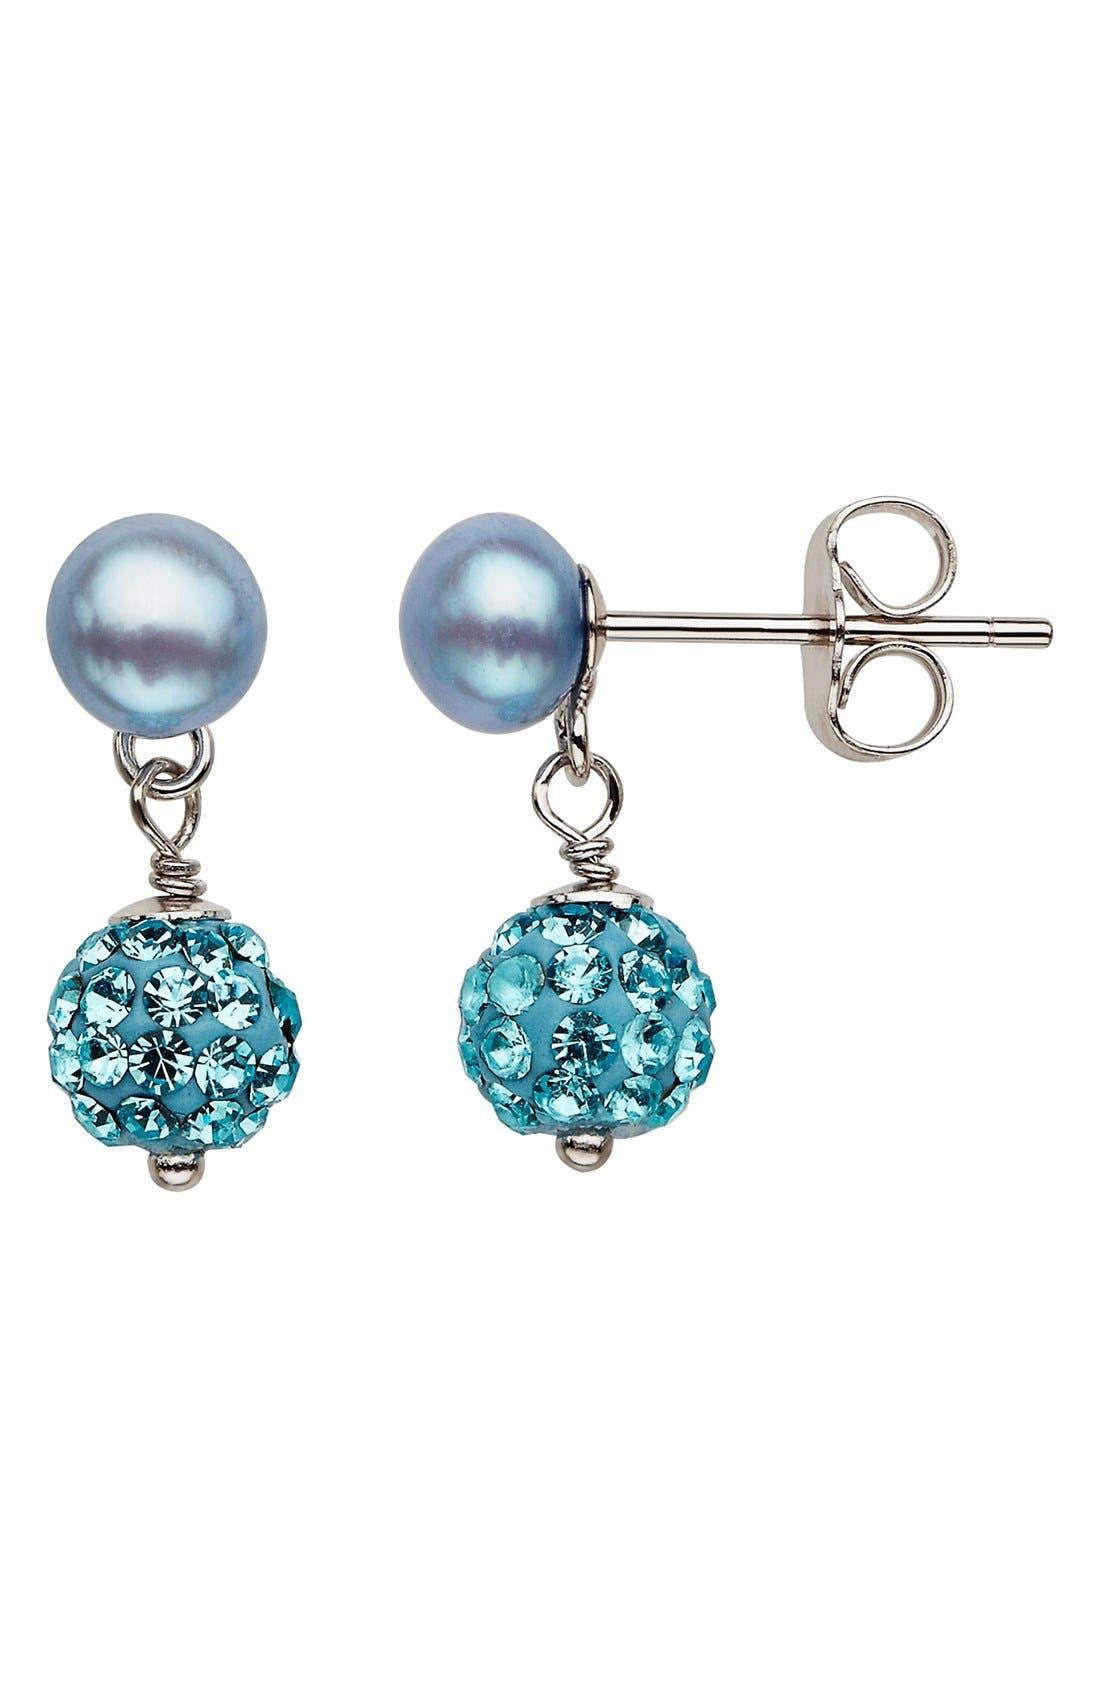 Crystal & FreshwaterPearl Earrings,                             Main thumbnail 1, color,                             Sky Blue